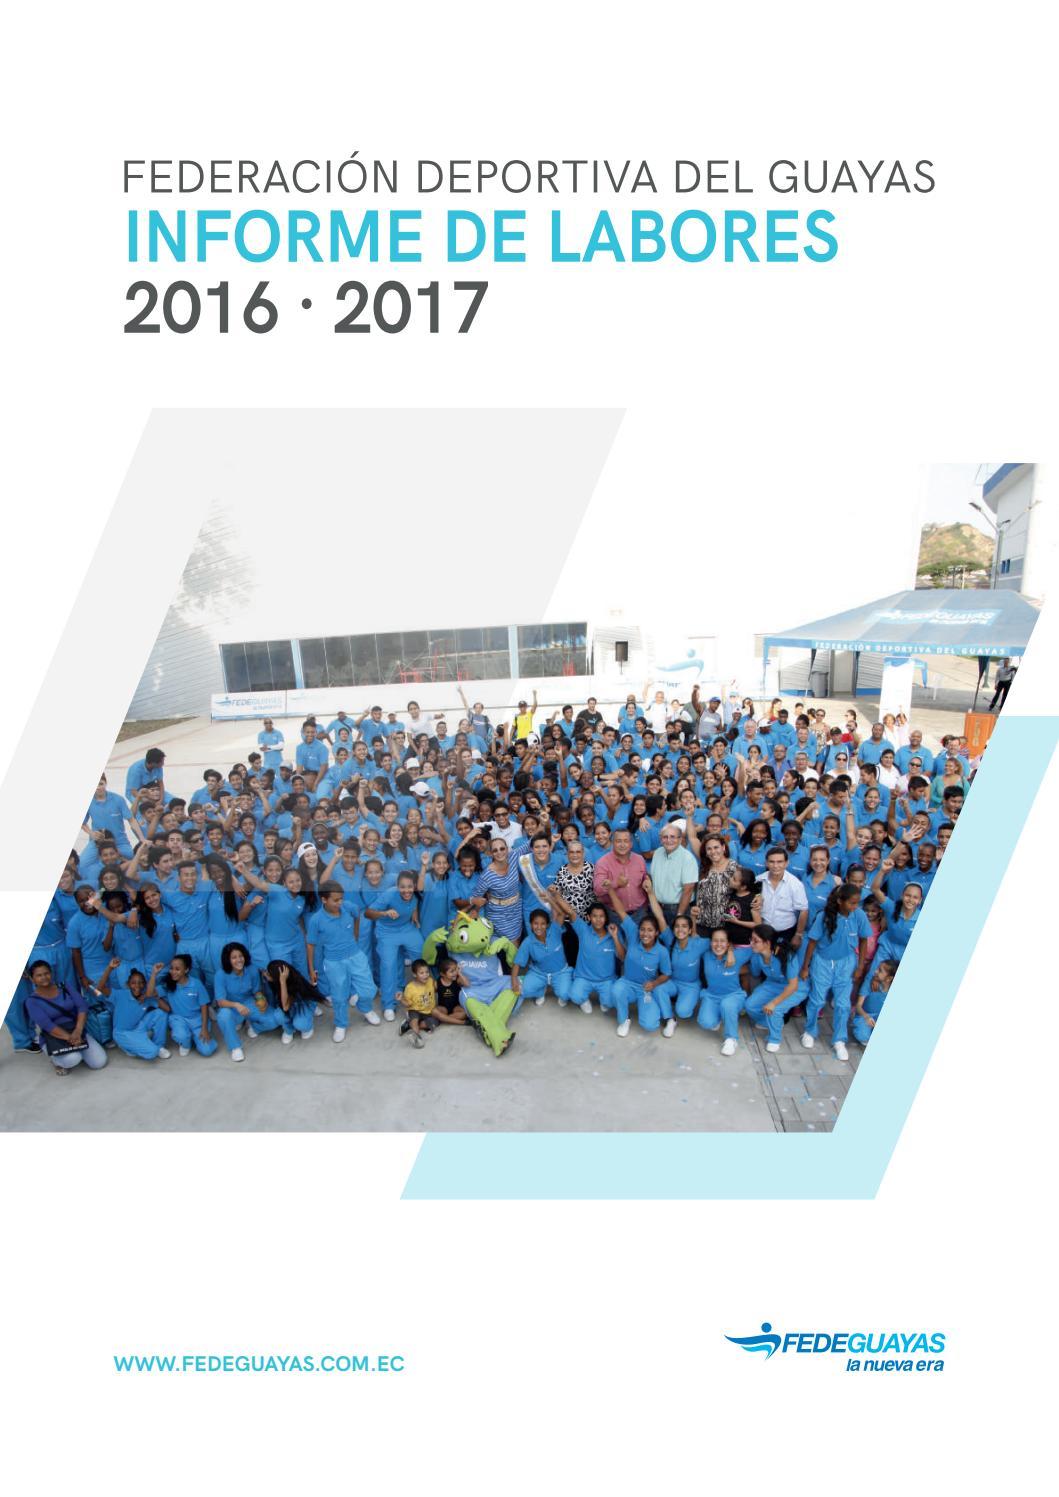 Informe de Labores 2016 · 2017 by Fedeguayas - issuu